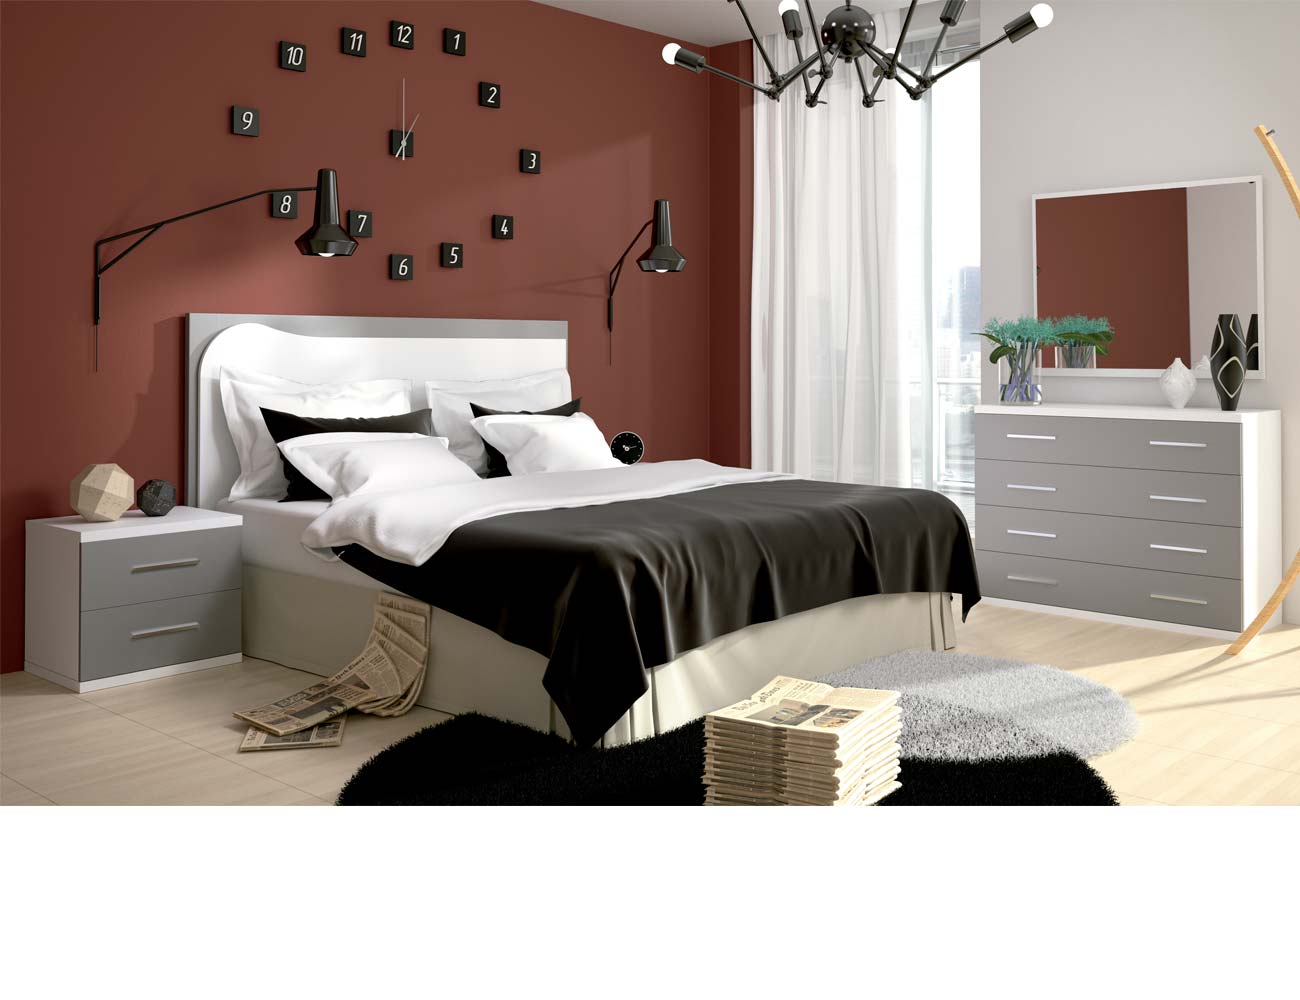 Dormitorio matrimonio moderno 20 blanco gris